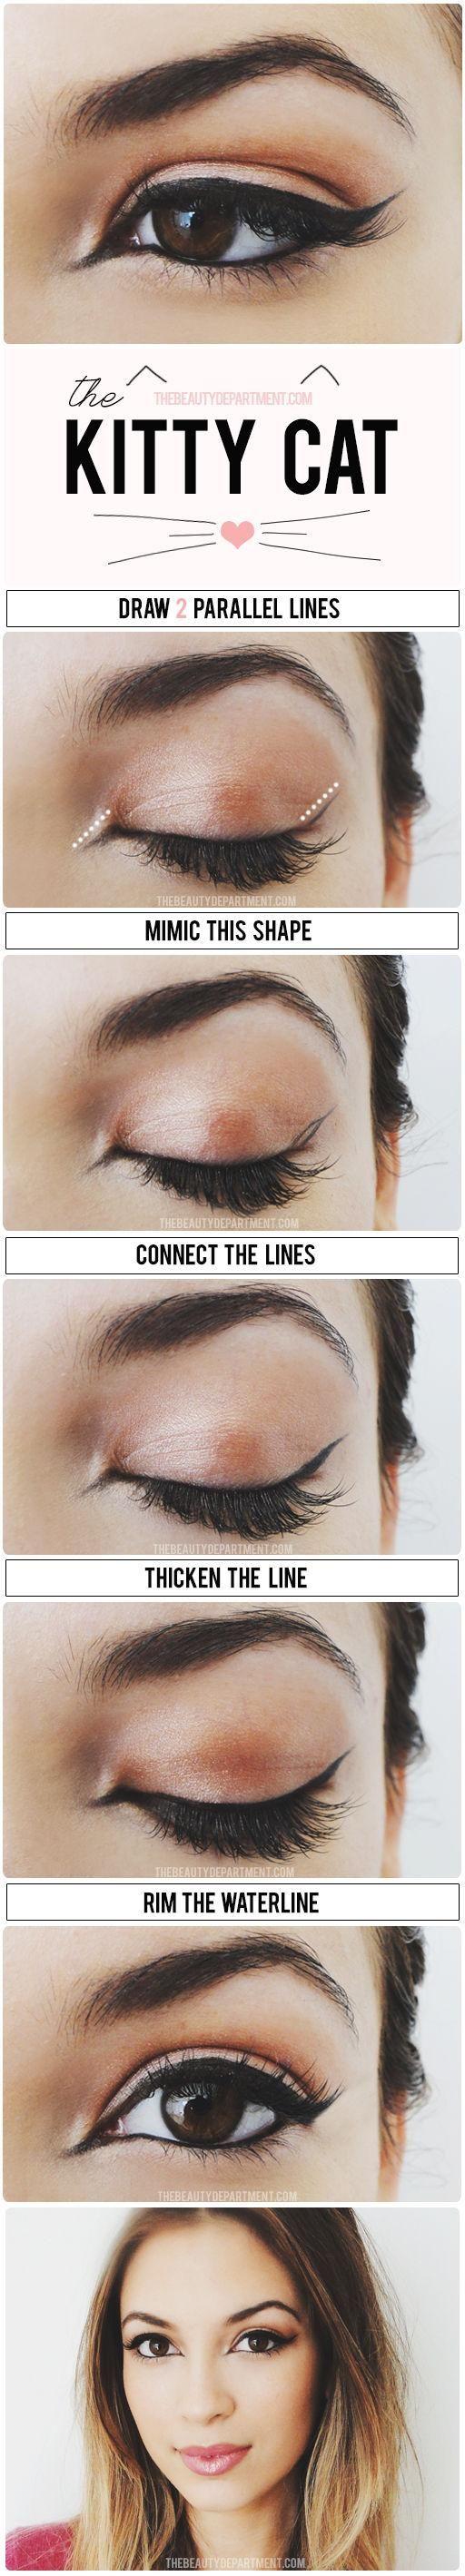 Feline cat eye inspired make up tutorial from @Matt Valk Chuah Beauty Department